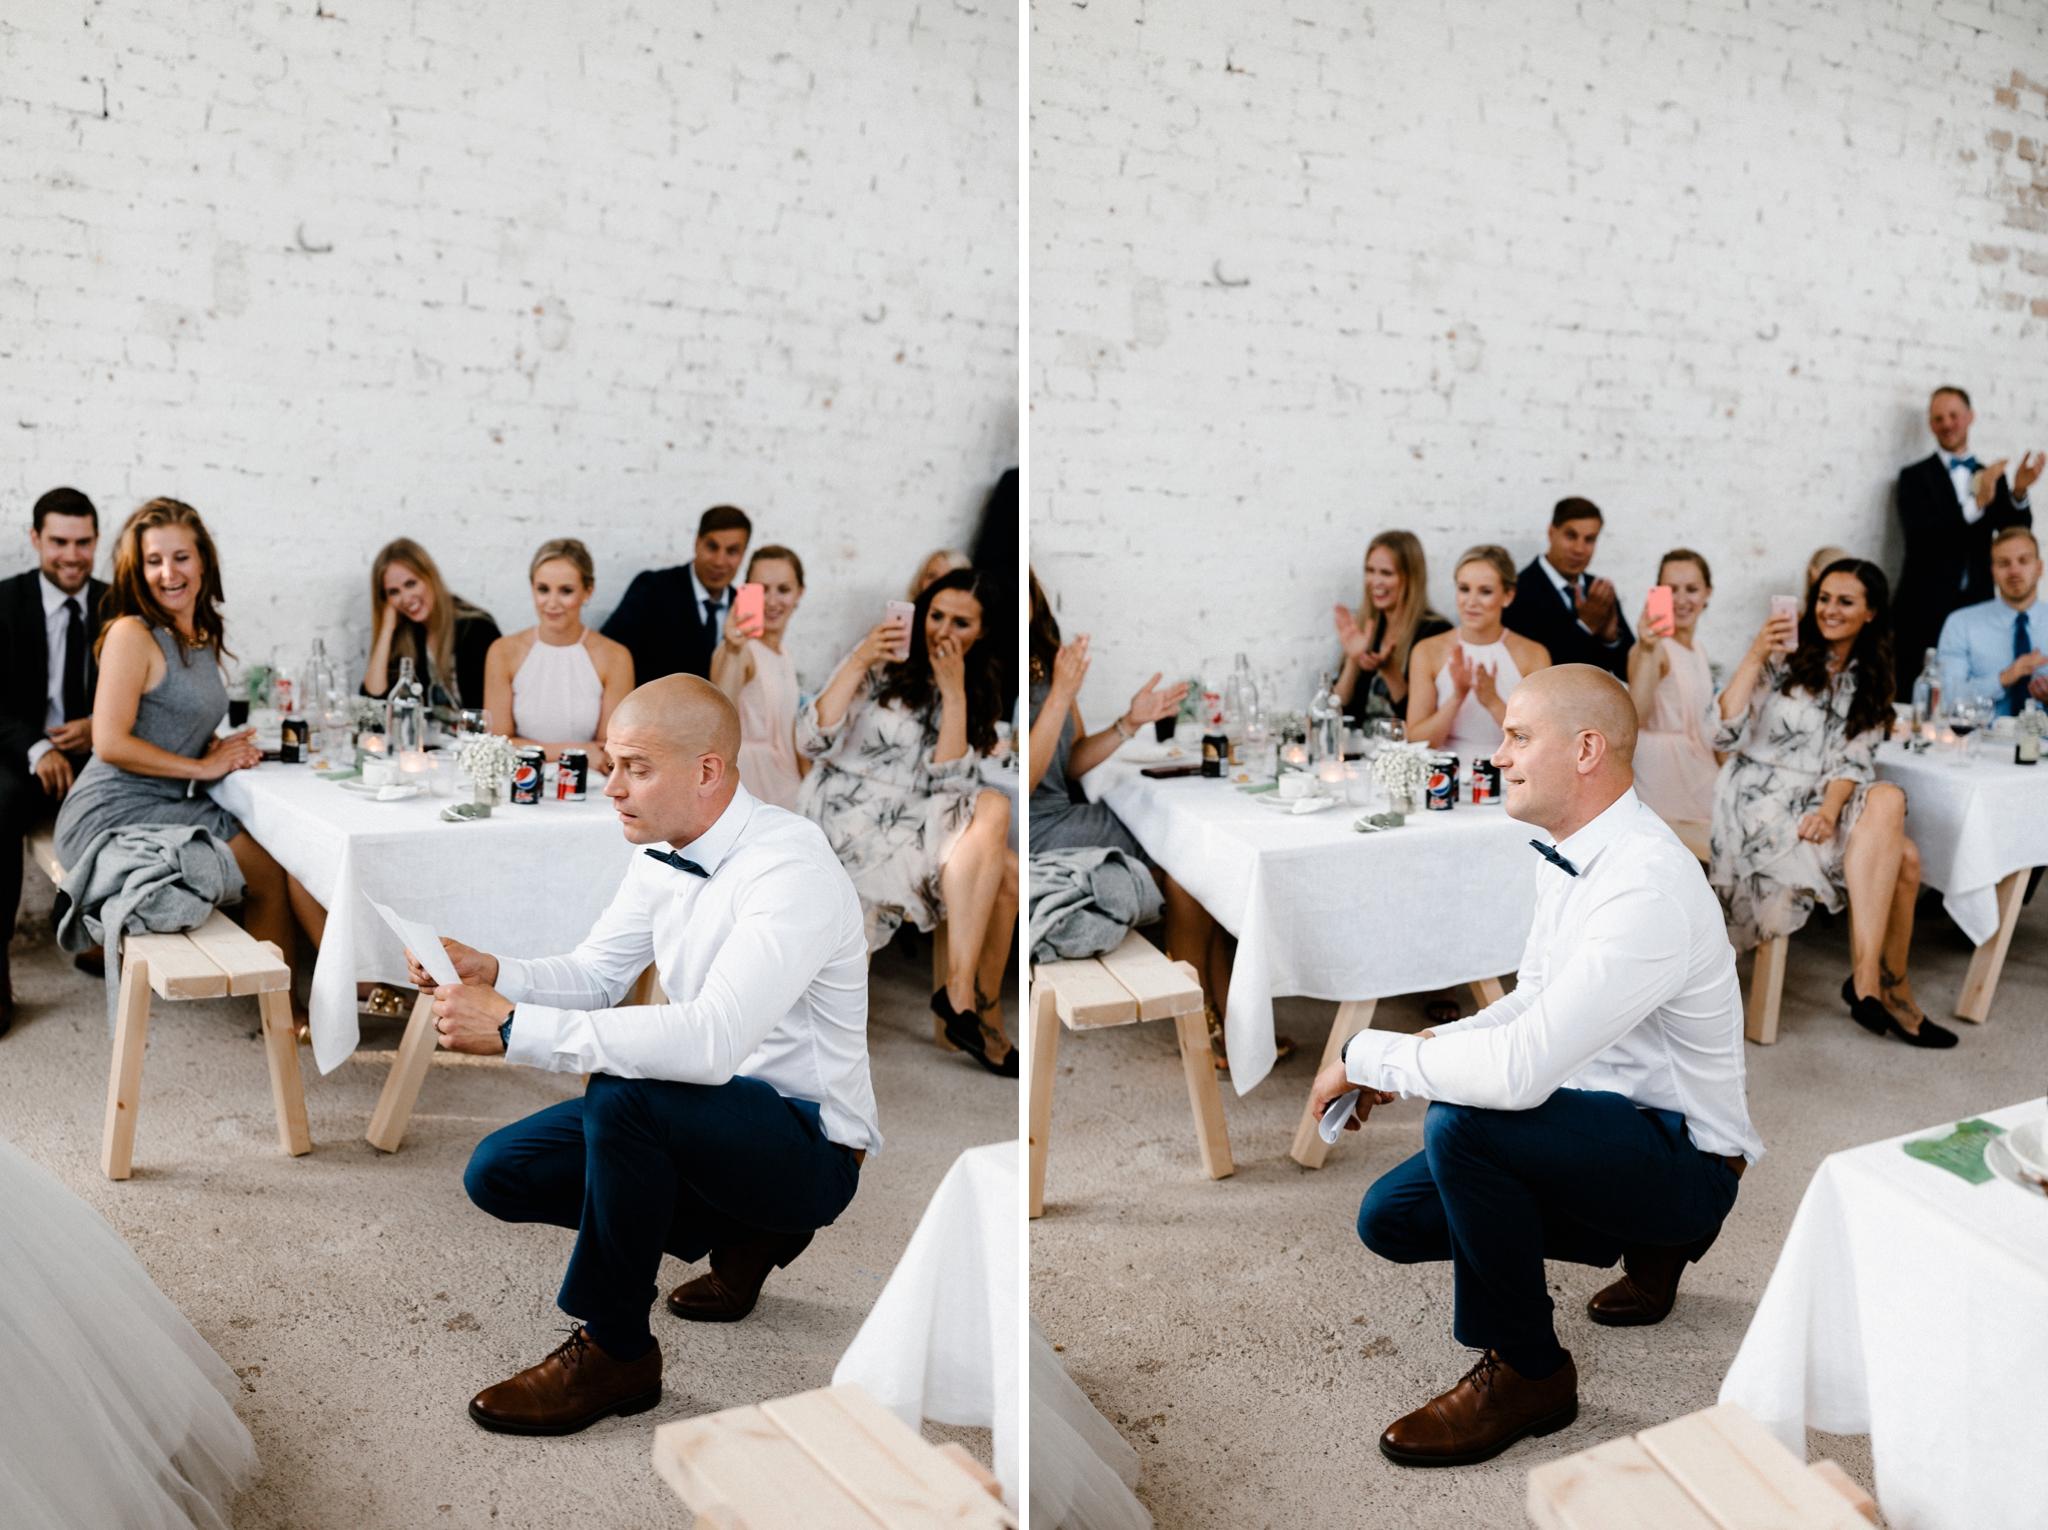 Essi + Ville   Oitbacka Gården   by Patrick Karkkolainen Wedding Photography-278.jpg